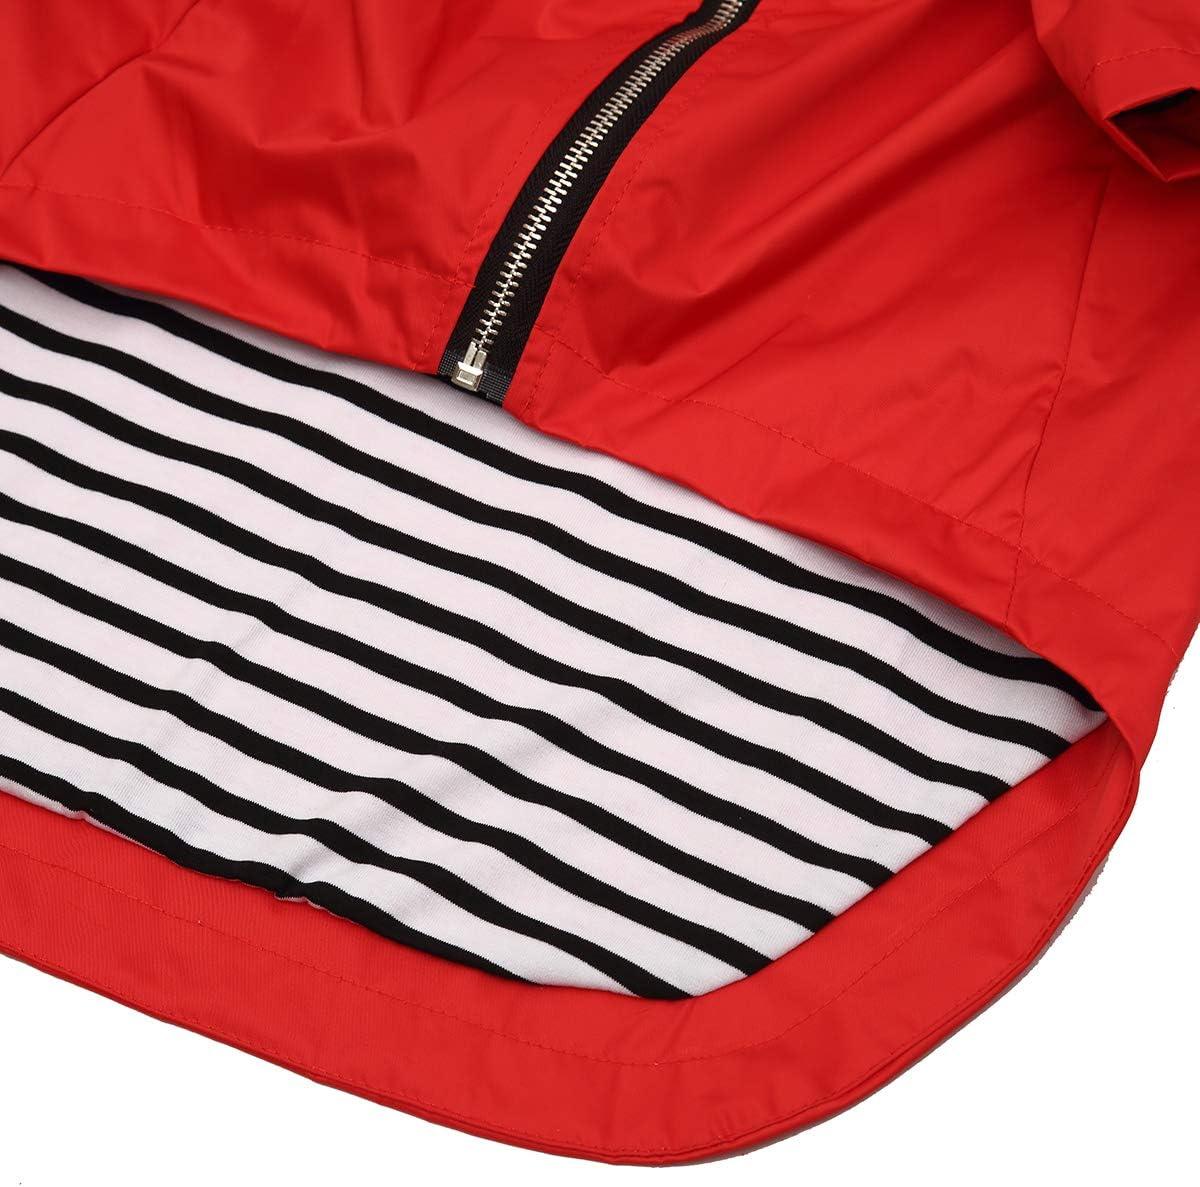 Size XS to XXL Available L Dog Zip Up Dog Raincoat with Hood,Rain//Water Resistant,Adjustable Drawstring,Pocket Design,Stylish Dog Raincoats Red